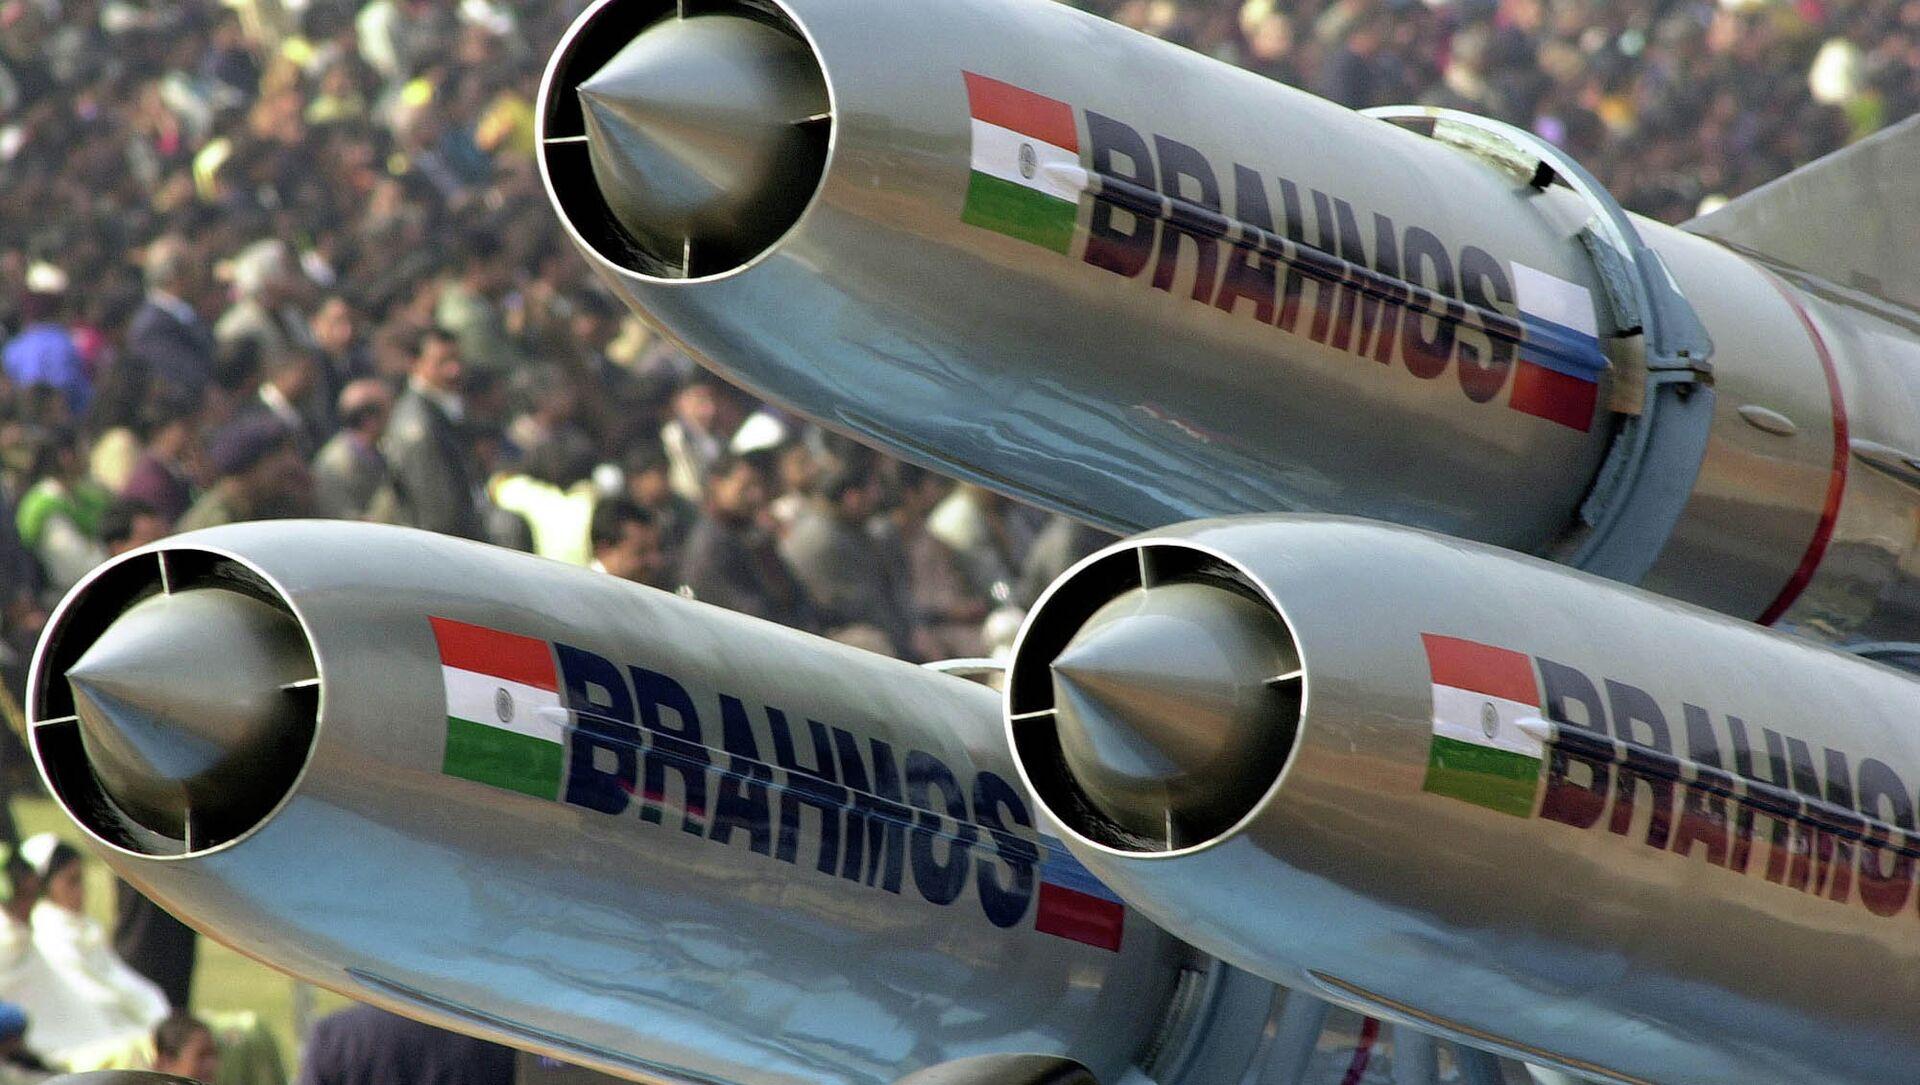 Missile supersonico da crociera Brahmos  - Sputnik Italia, 1920, 16.03.2021